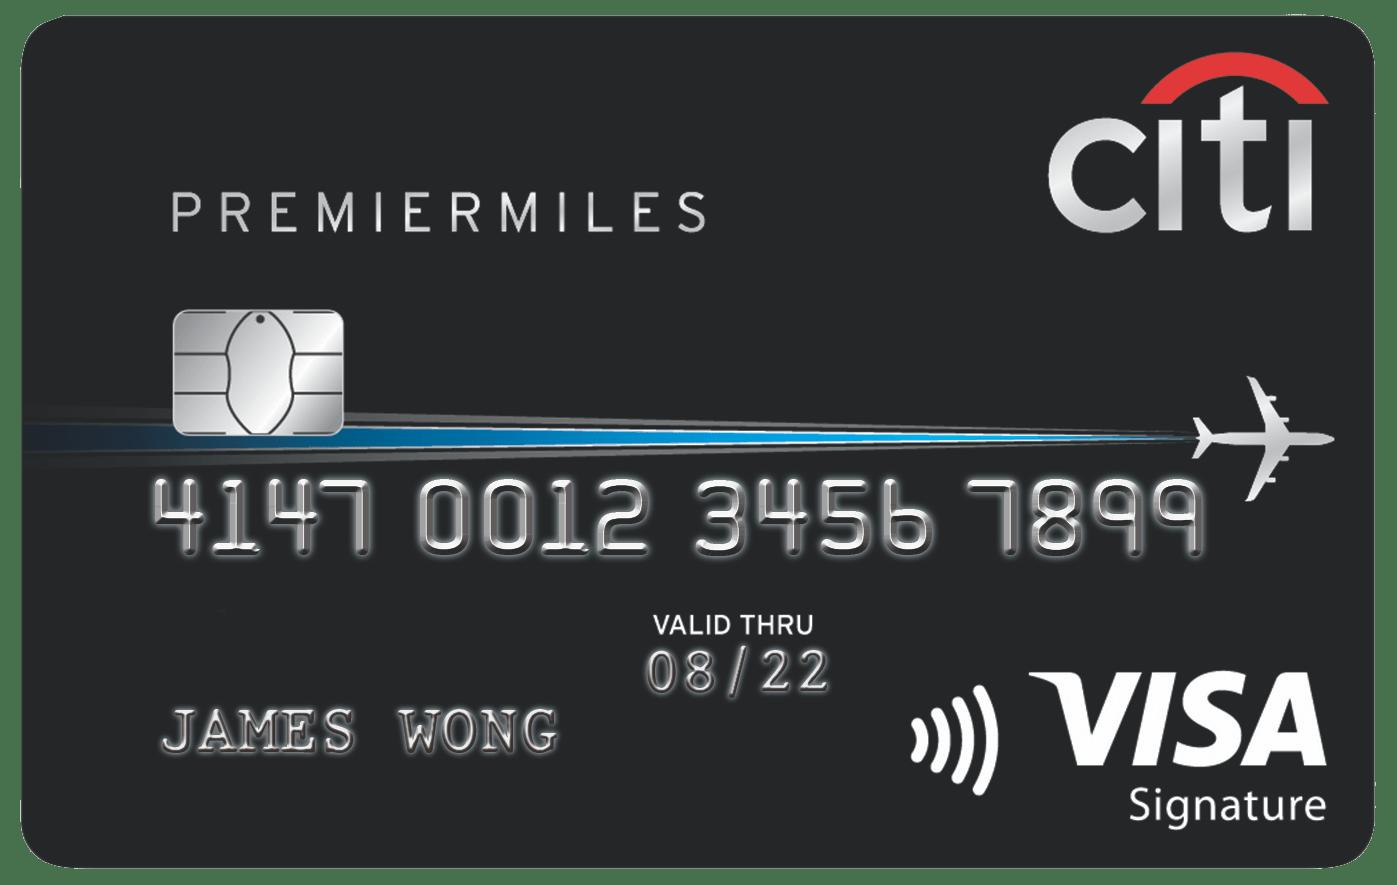 Citi PremierMiles Credit Card   Singapore 2018   Credit ...